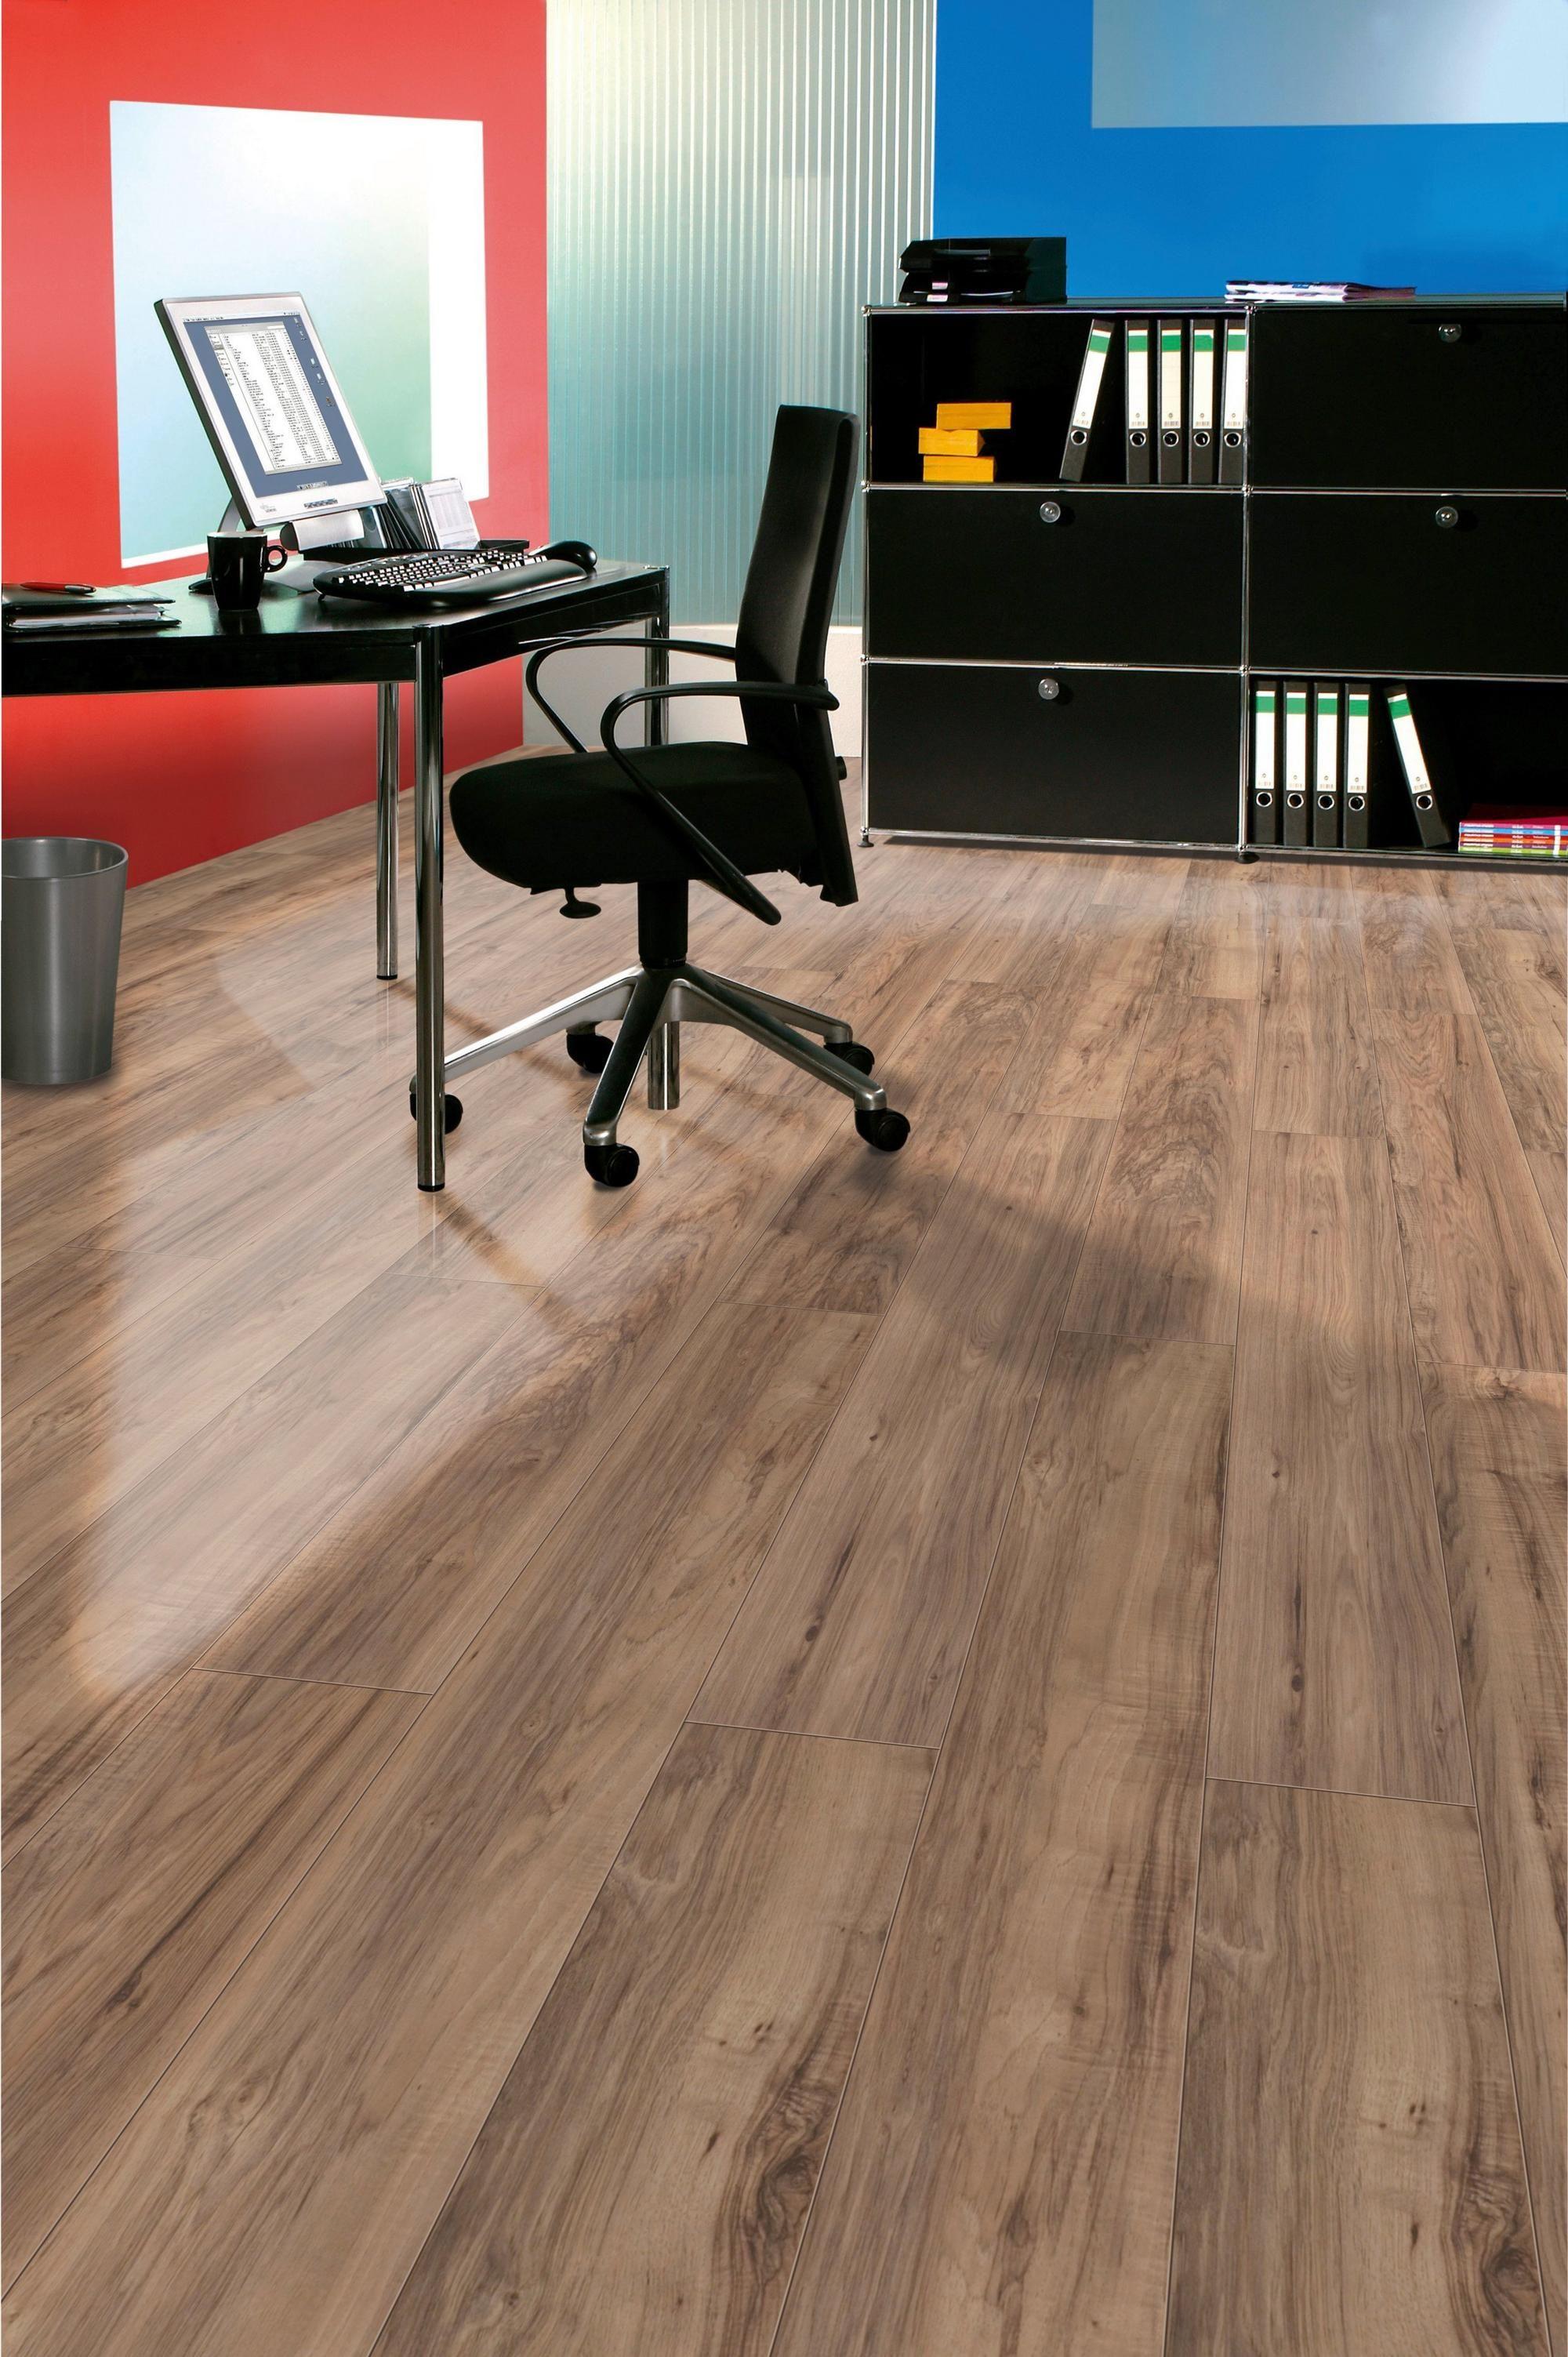 Light Laminate and Vinyl Flooring Floor & Decor